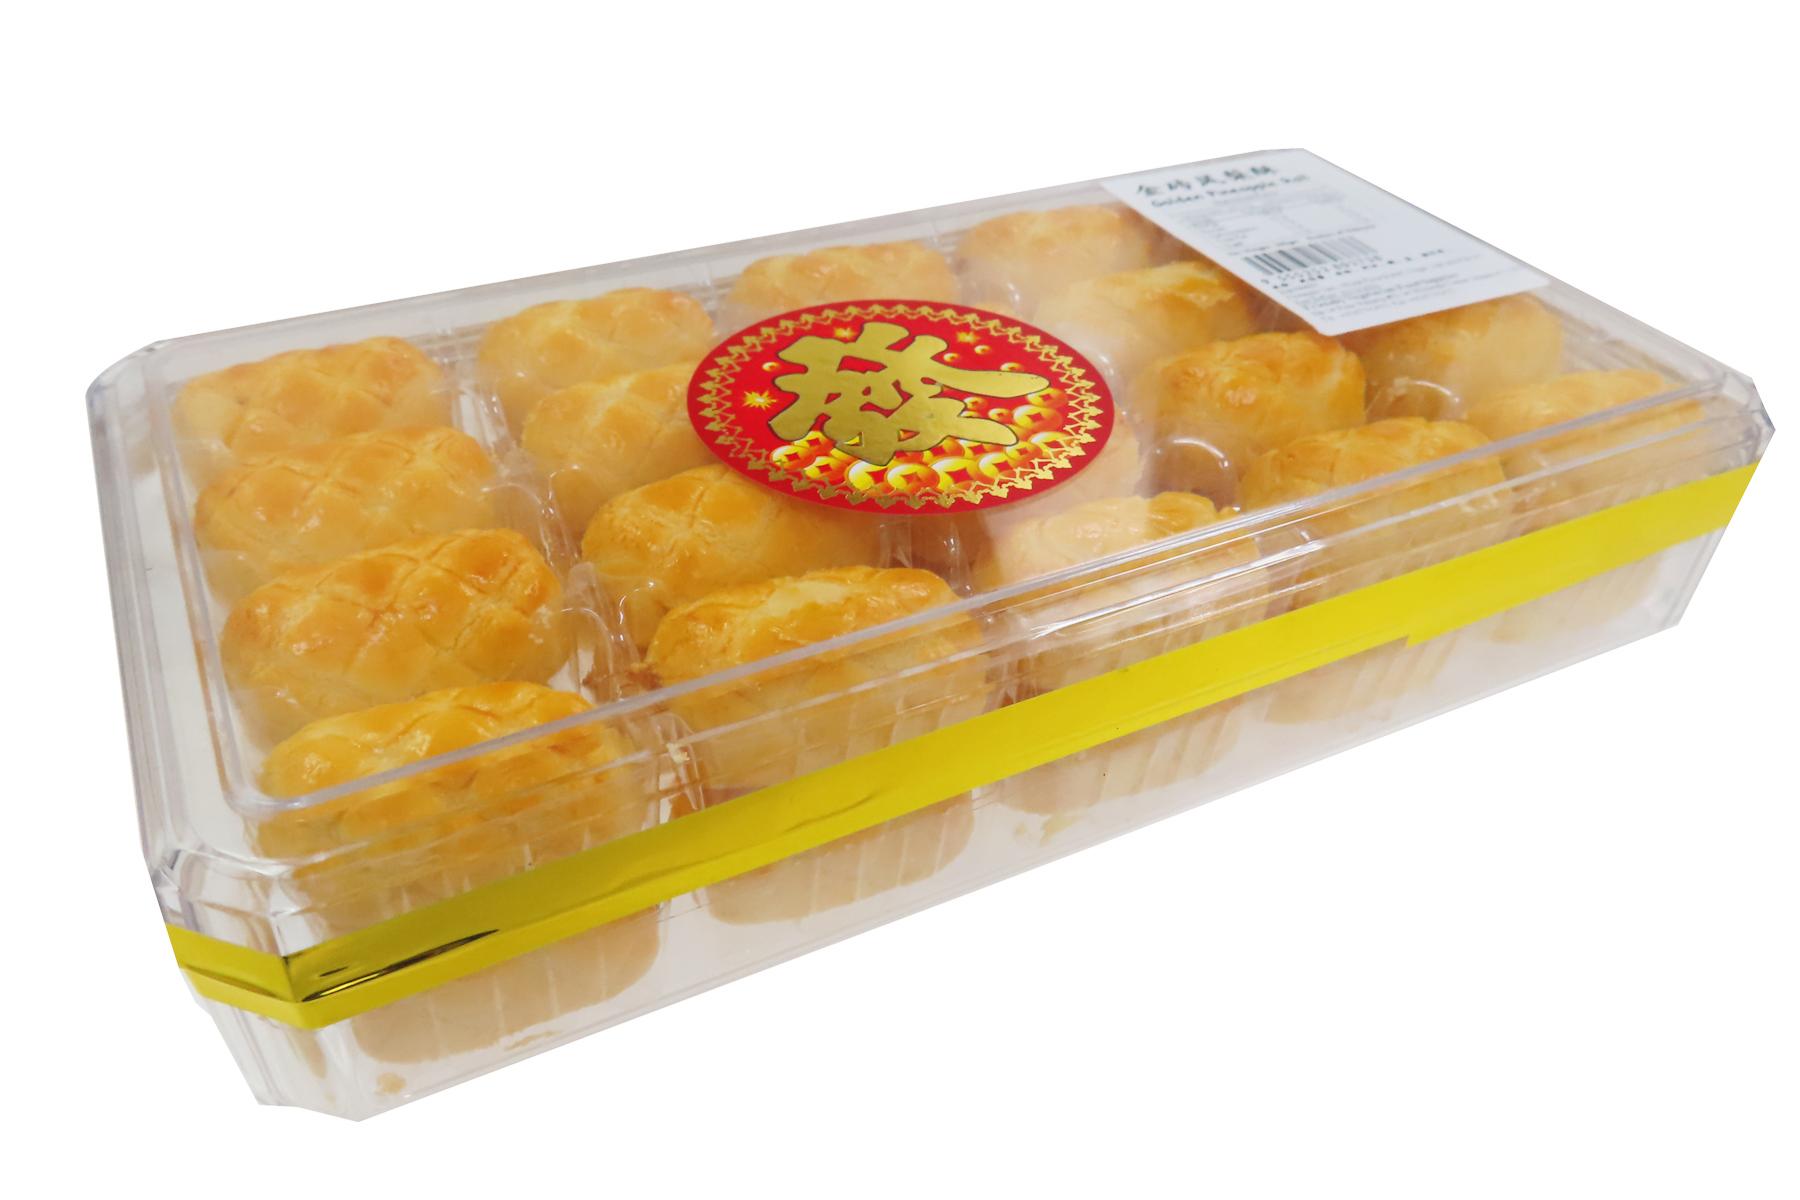 Image Pineapple Roll  花型金條酥/凤梨酥 360grams